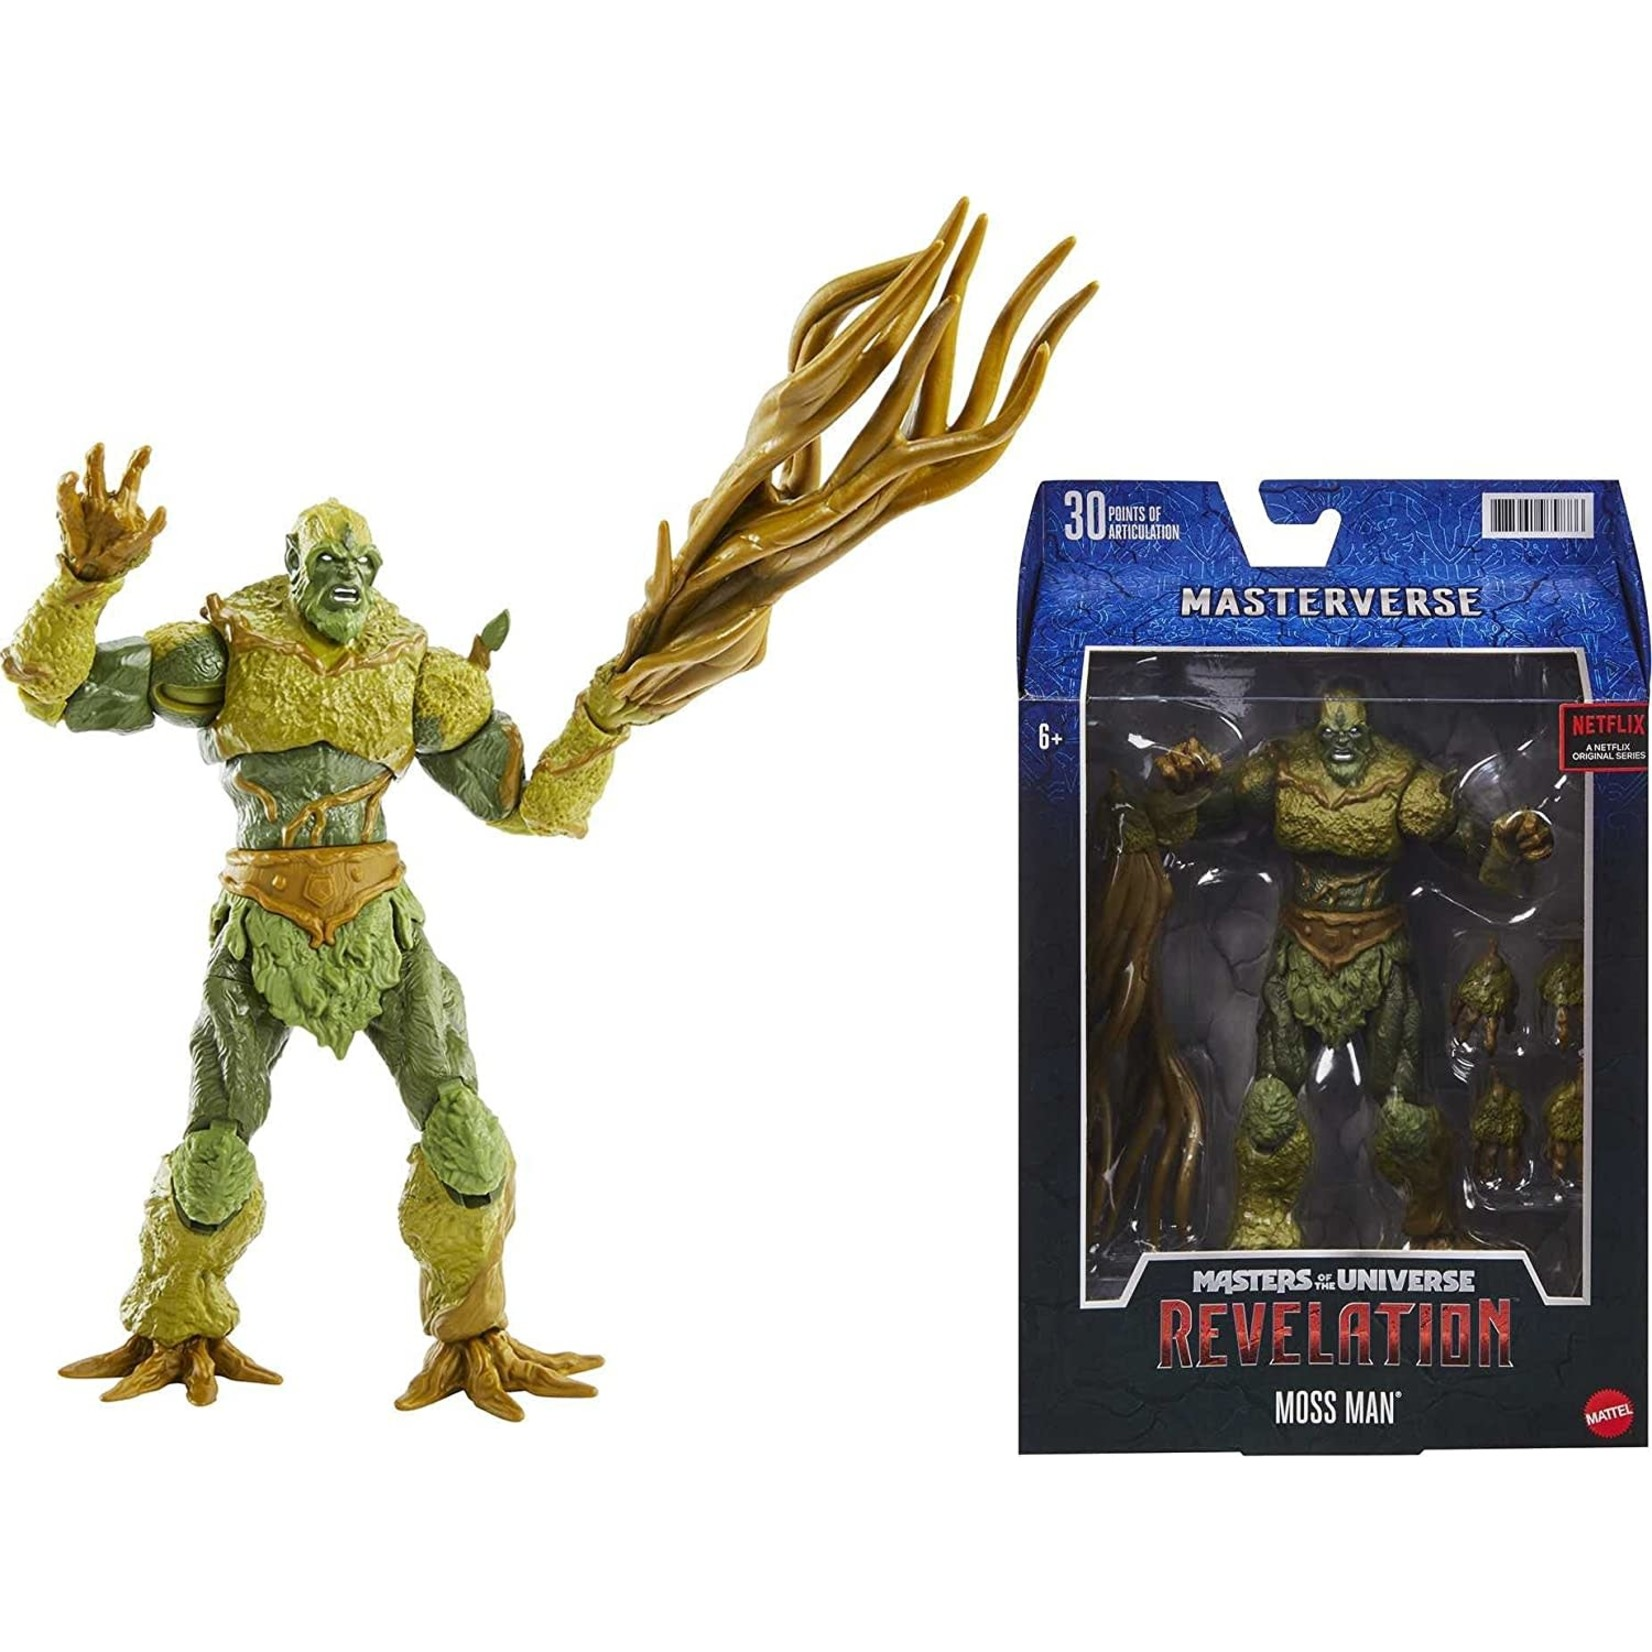 Mattel Masters of the Universe Masterverse Revelation Moss Man Action Figure